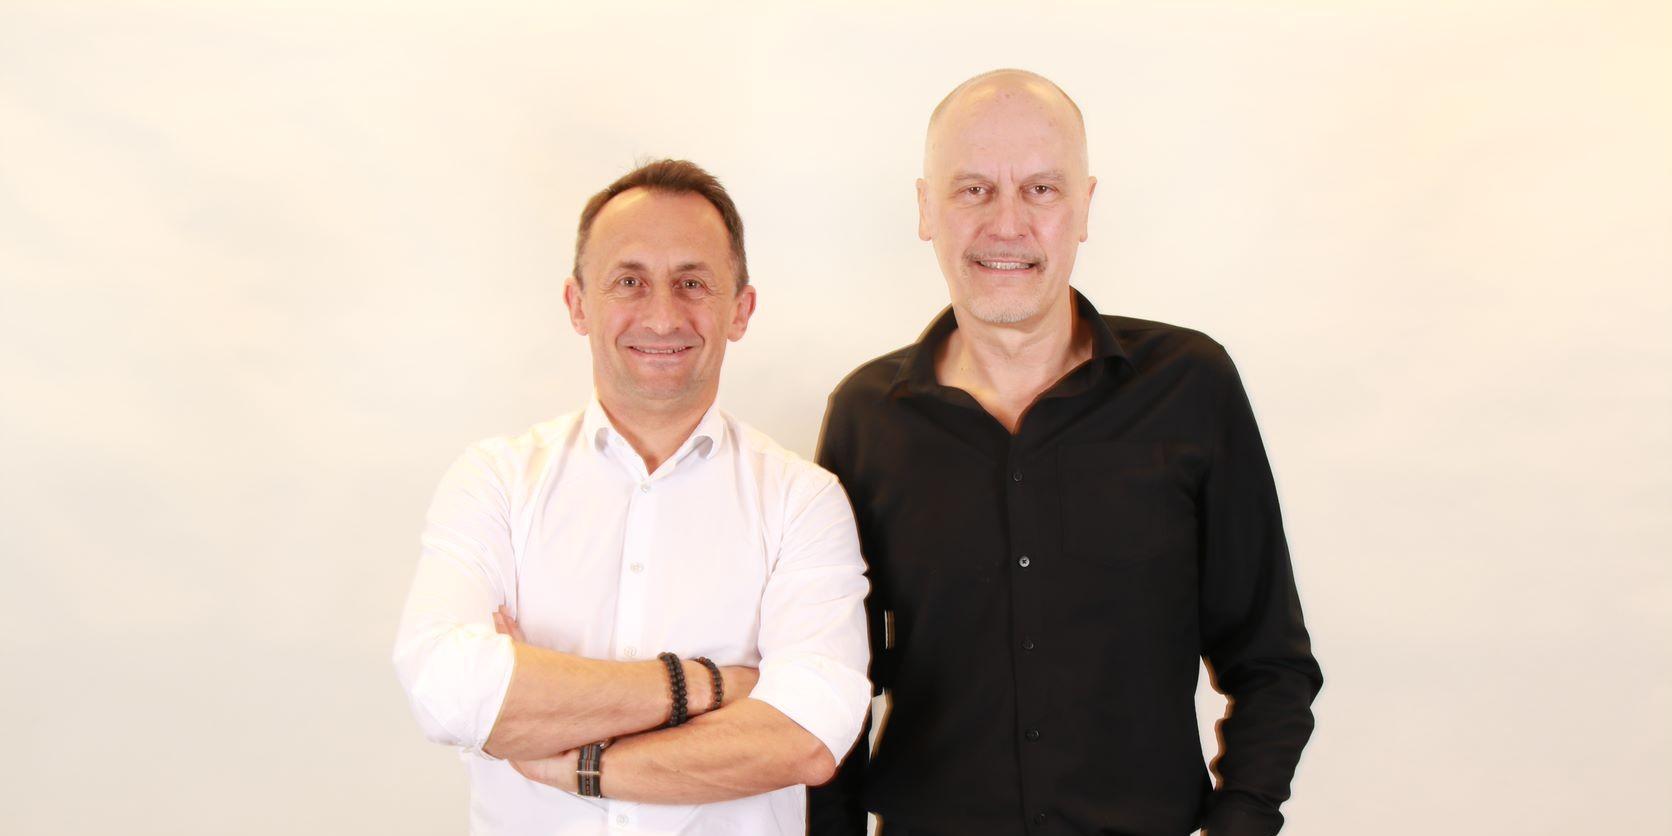 Fabrice Maquignon remplace Dirk Debraekeleer à la tête de Mediagenix